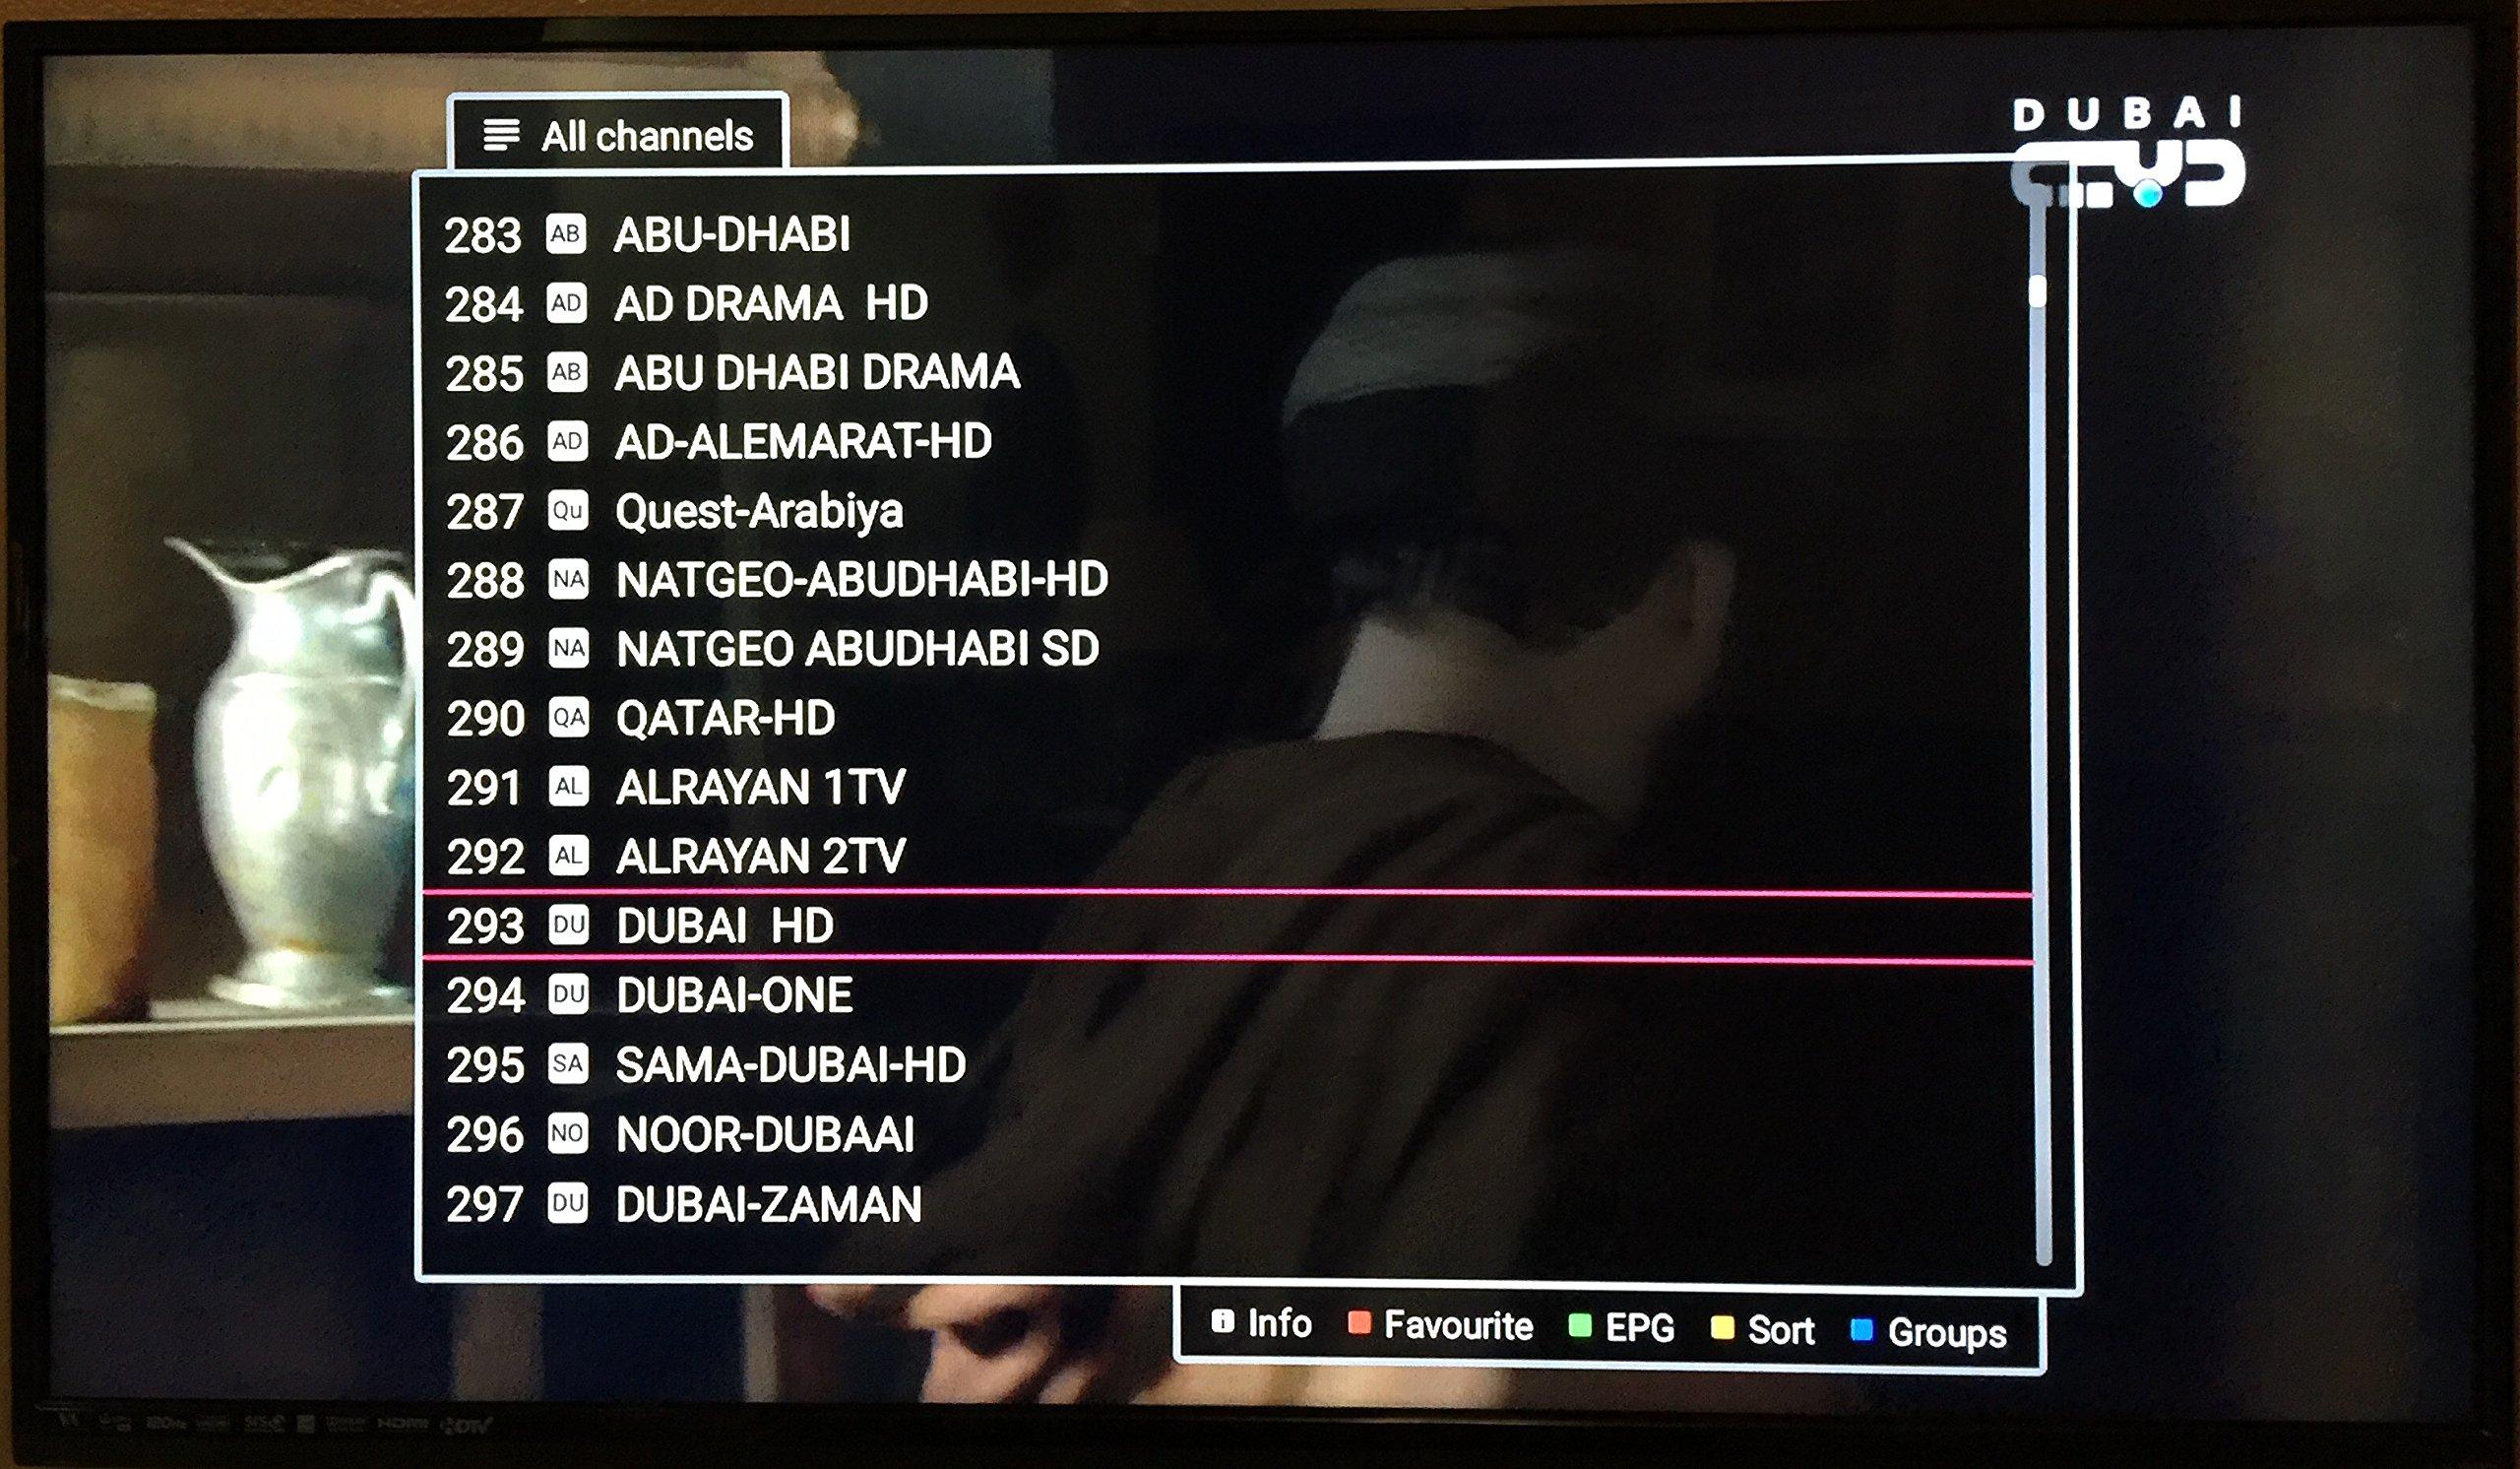 Arabia TV Super HD Receiver with 3000 Channel جهاز العائلة للقنواة العربية والعالمية (3000 Channel) by iptv+ (Image #3)